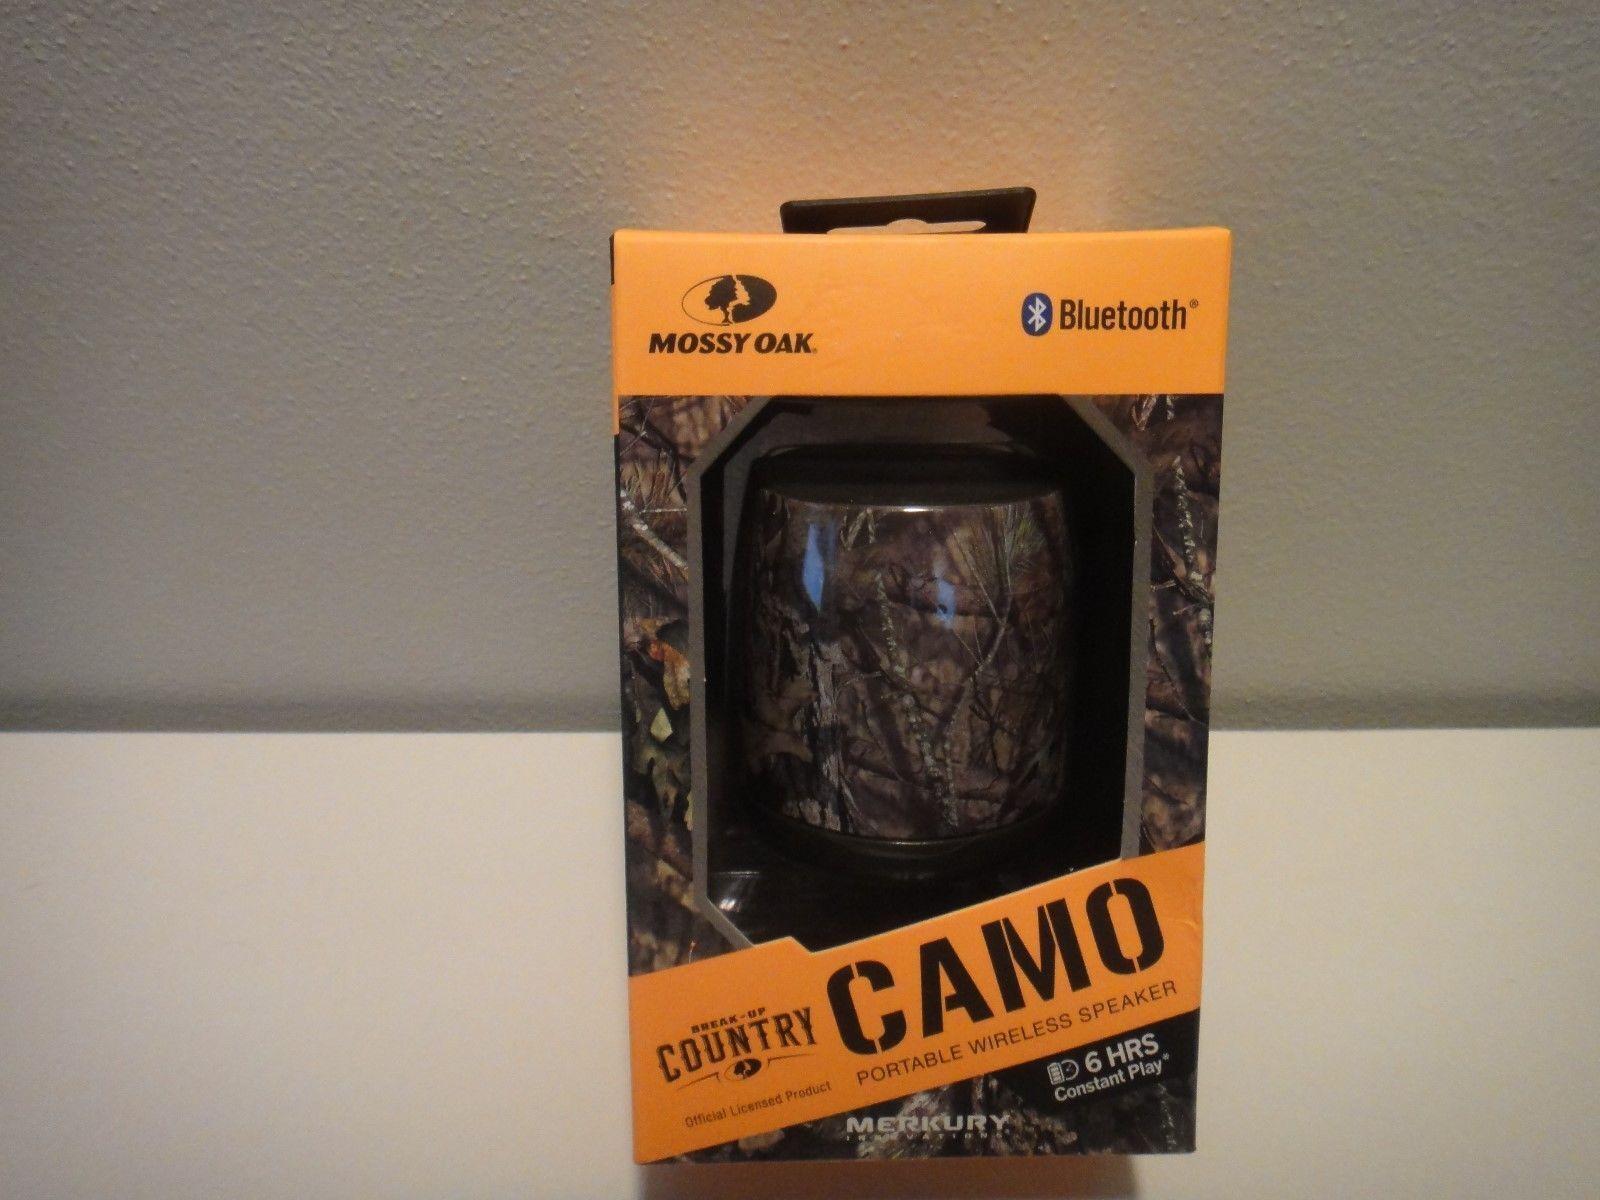 Mossy Oak Camo Portable Wireless Speaker With Bluetooth Ebay Plastic Smart Bracelet Circuit Board High Stock Photo